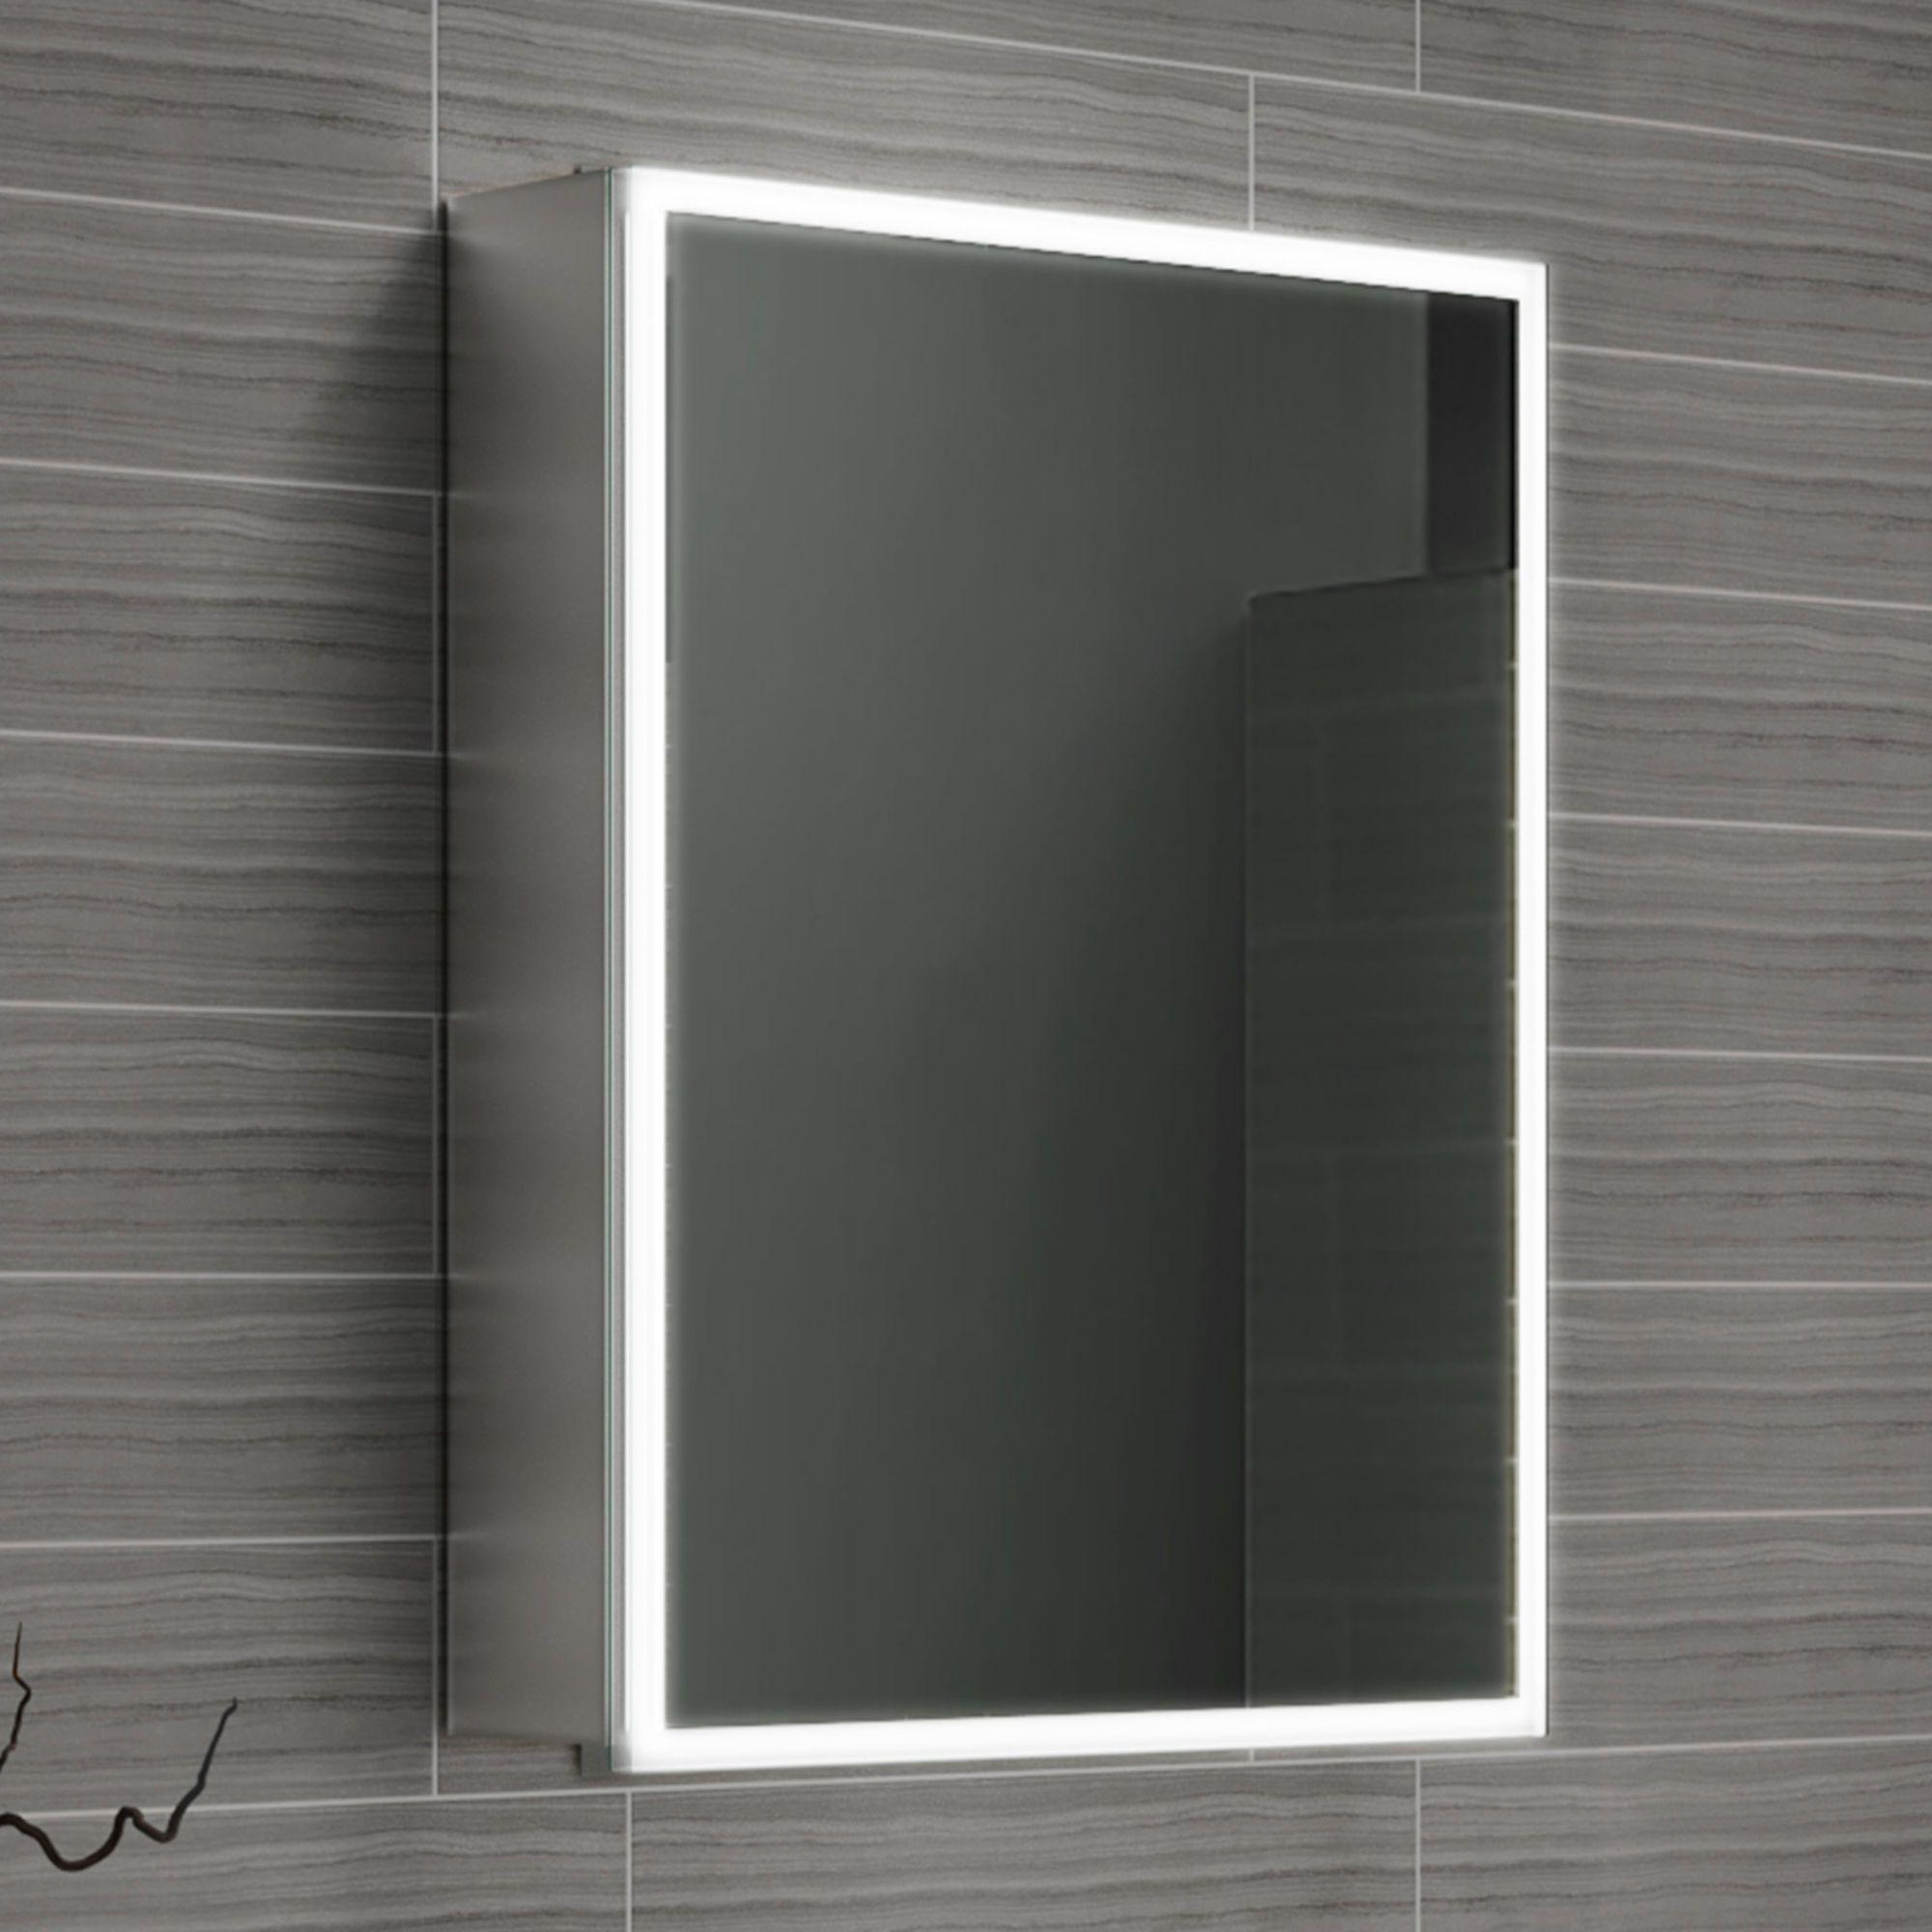 450x600 Cosmic Illuminated Led Mirror Cabinet Soak Com Mirror Cabinets Led Mirror Bathroom Inspiration Decor